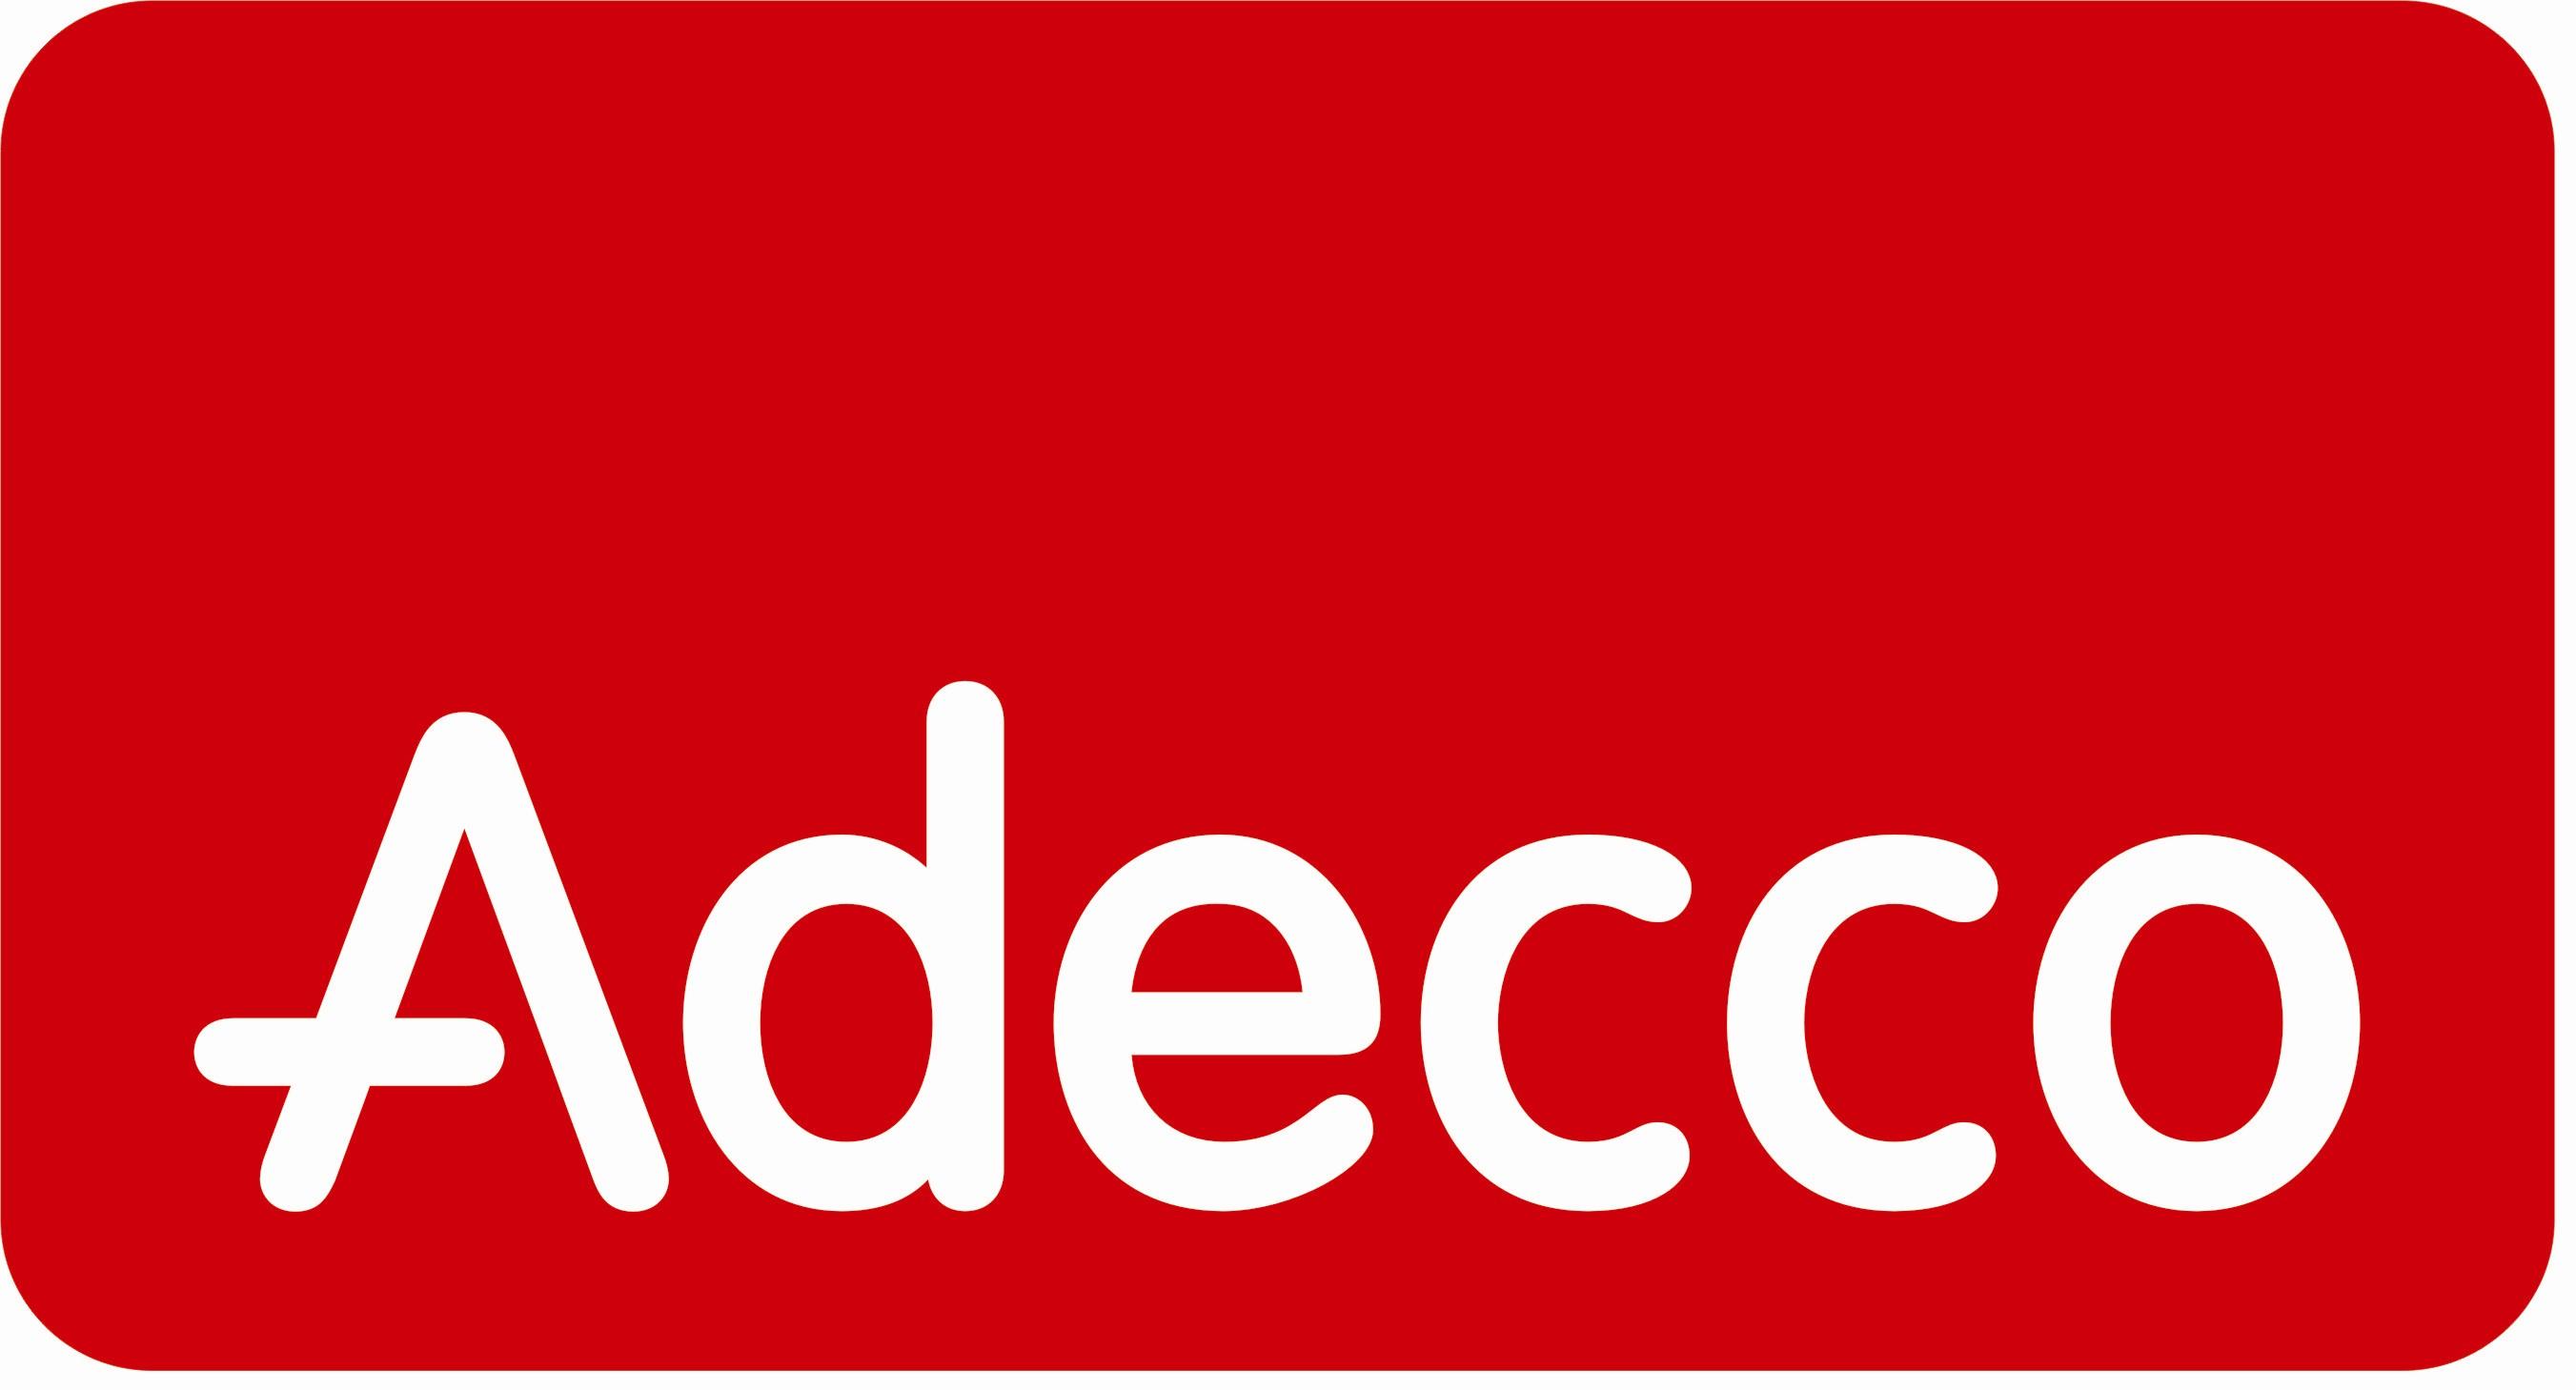 Adecco india headquartered in bangalore dating 3